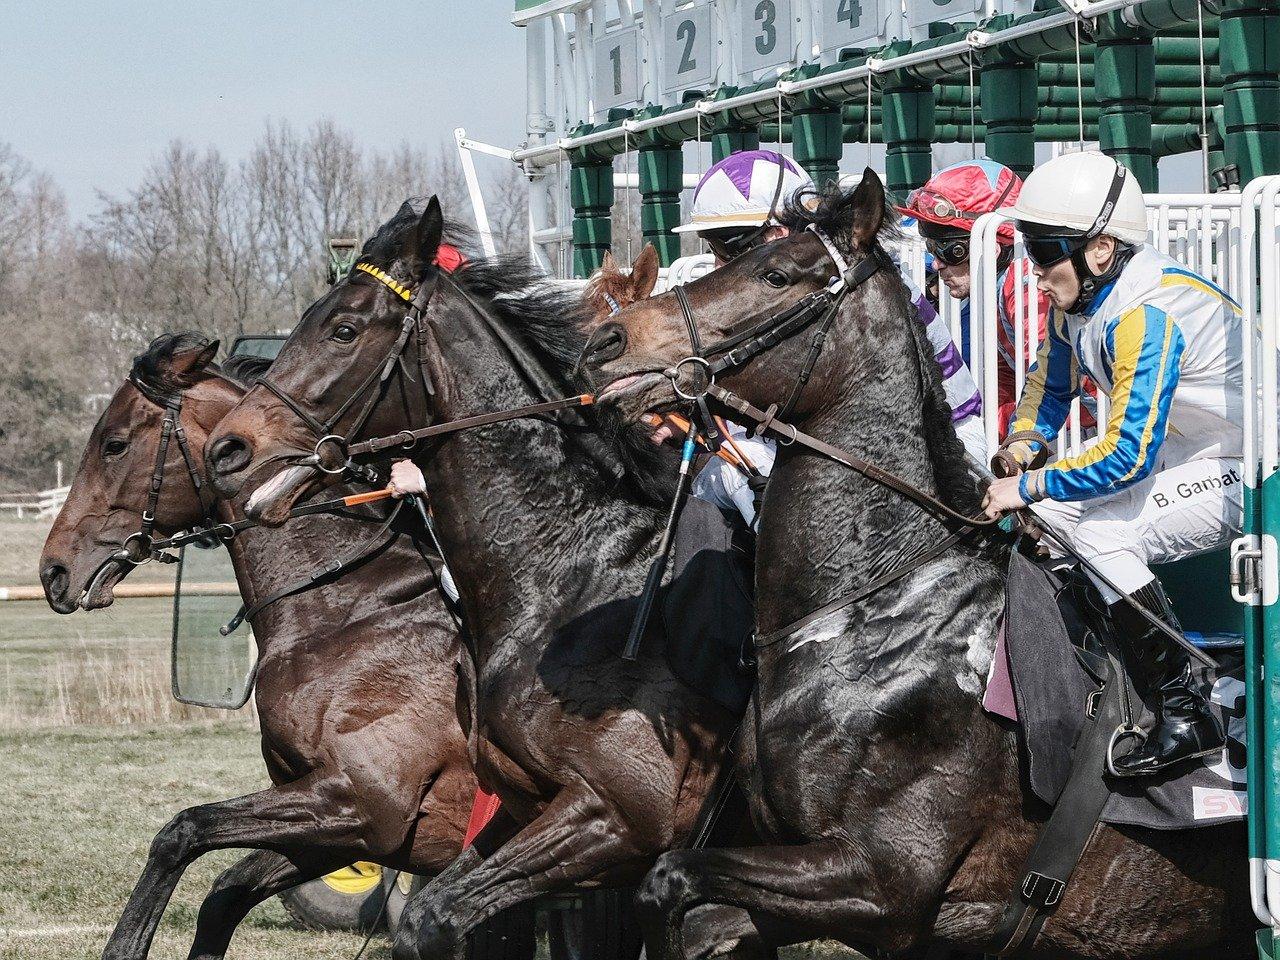 Horse Racing in Gulfstream Park